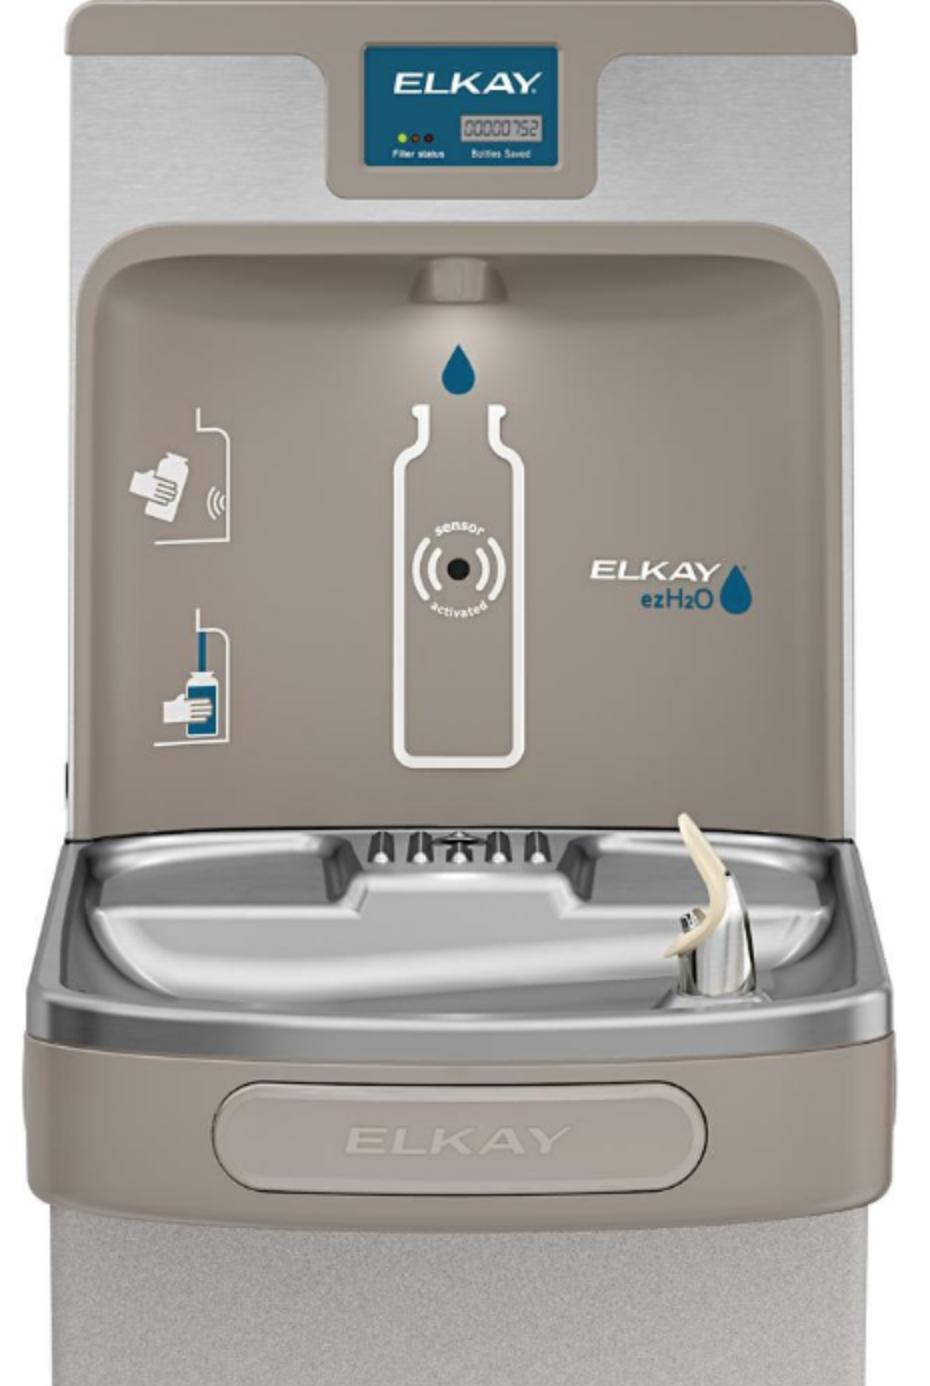 Tap Water Watch Launches New Platform to Help Schools Fund